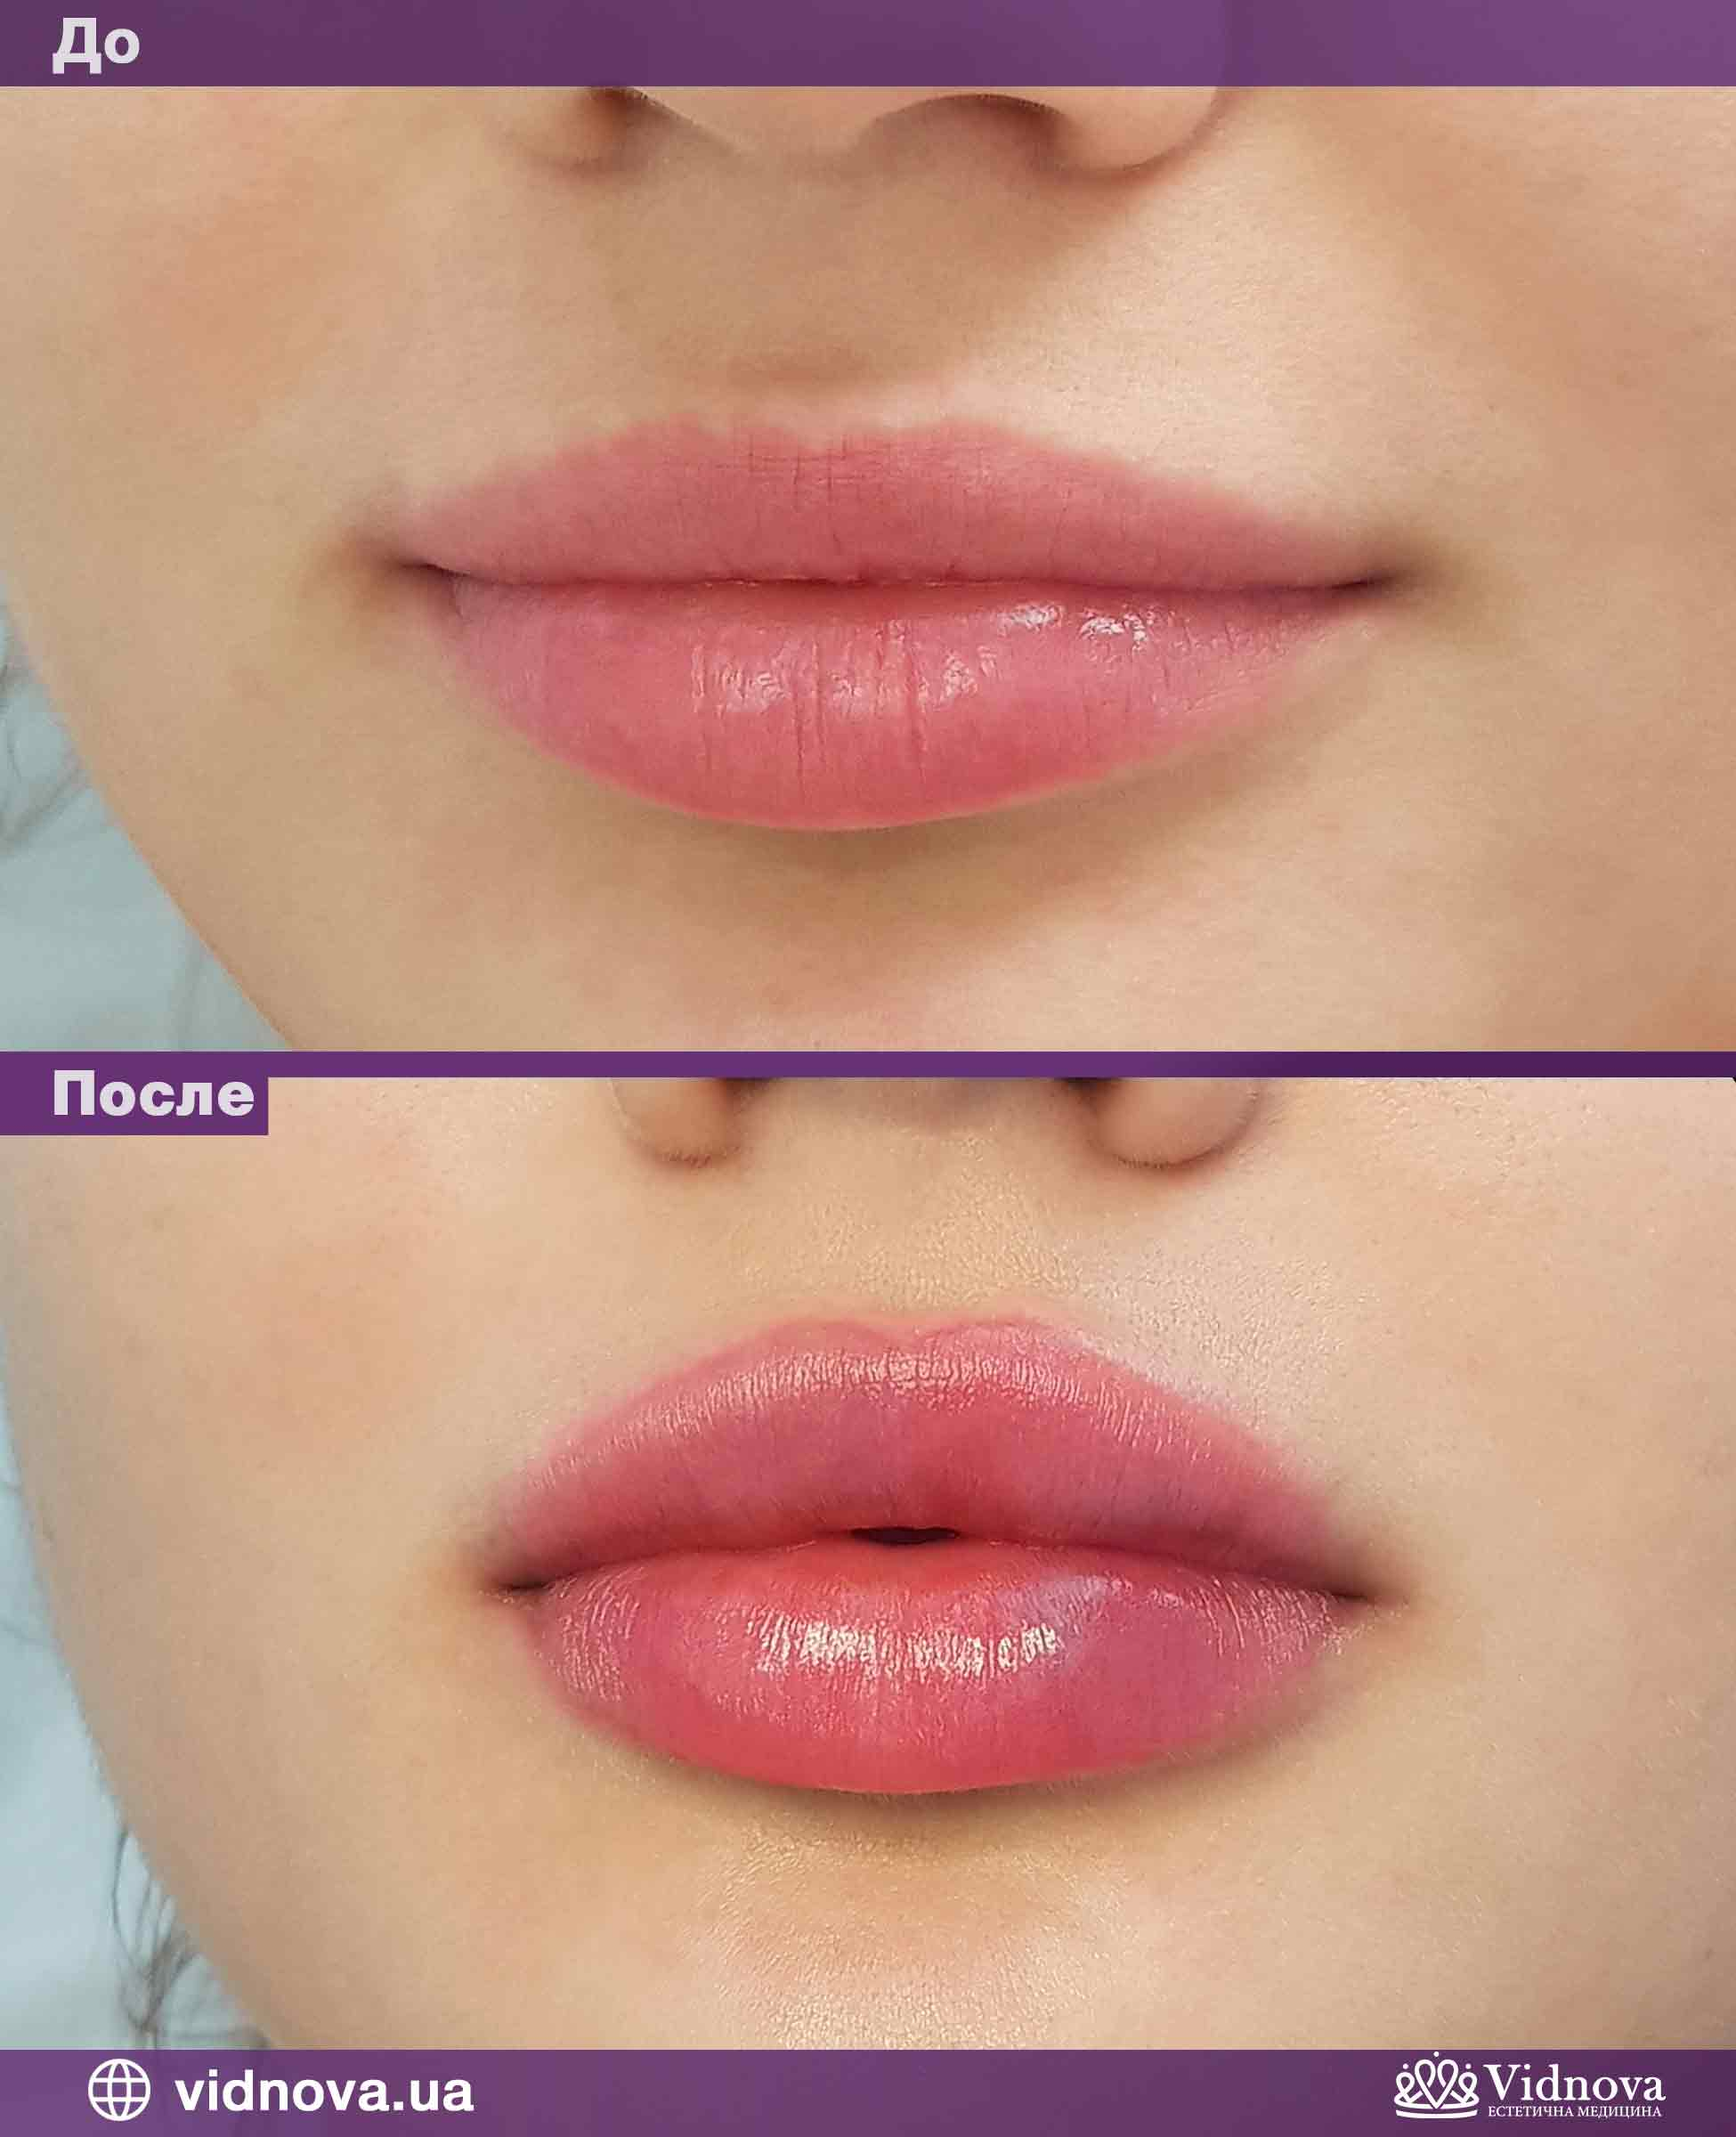 Увеличение губ: Фото До и После - Пример №4-2 - Клиника Vidnova